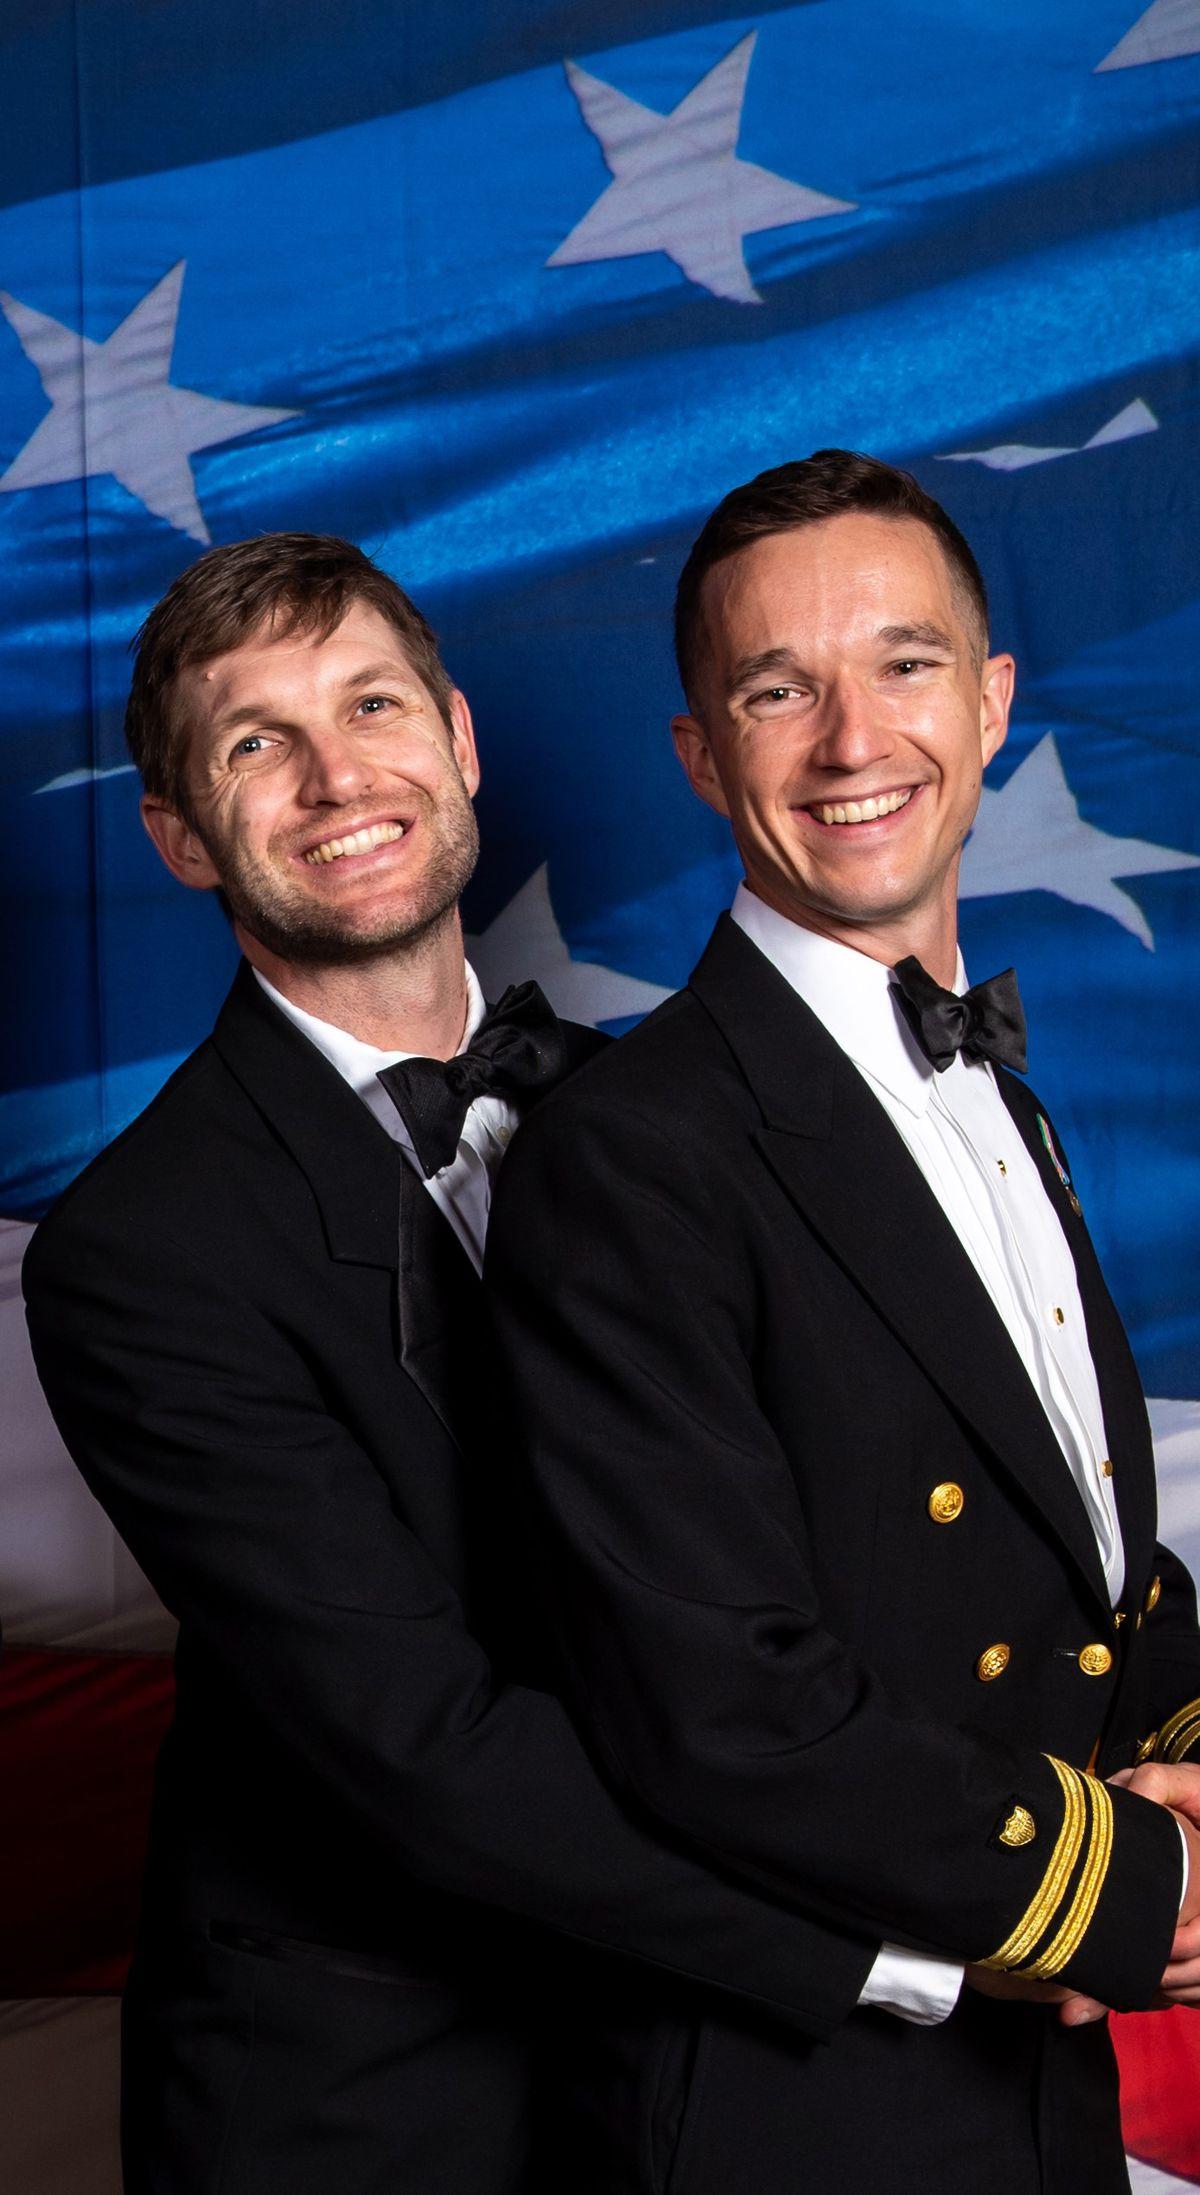 John Olbrys with boyfriend Dave Payne at the Coast Guard ball.